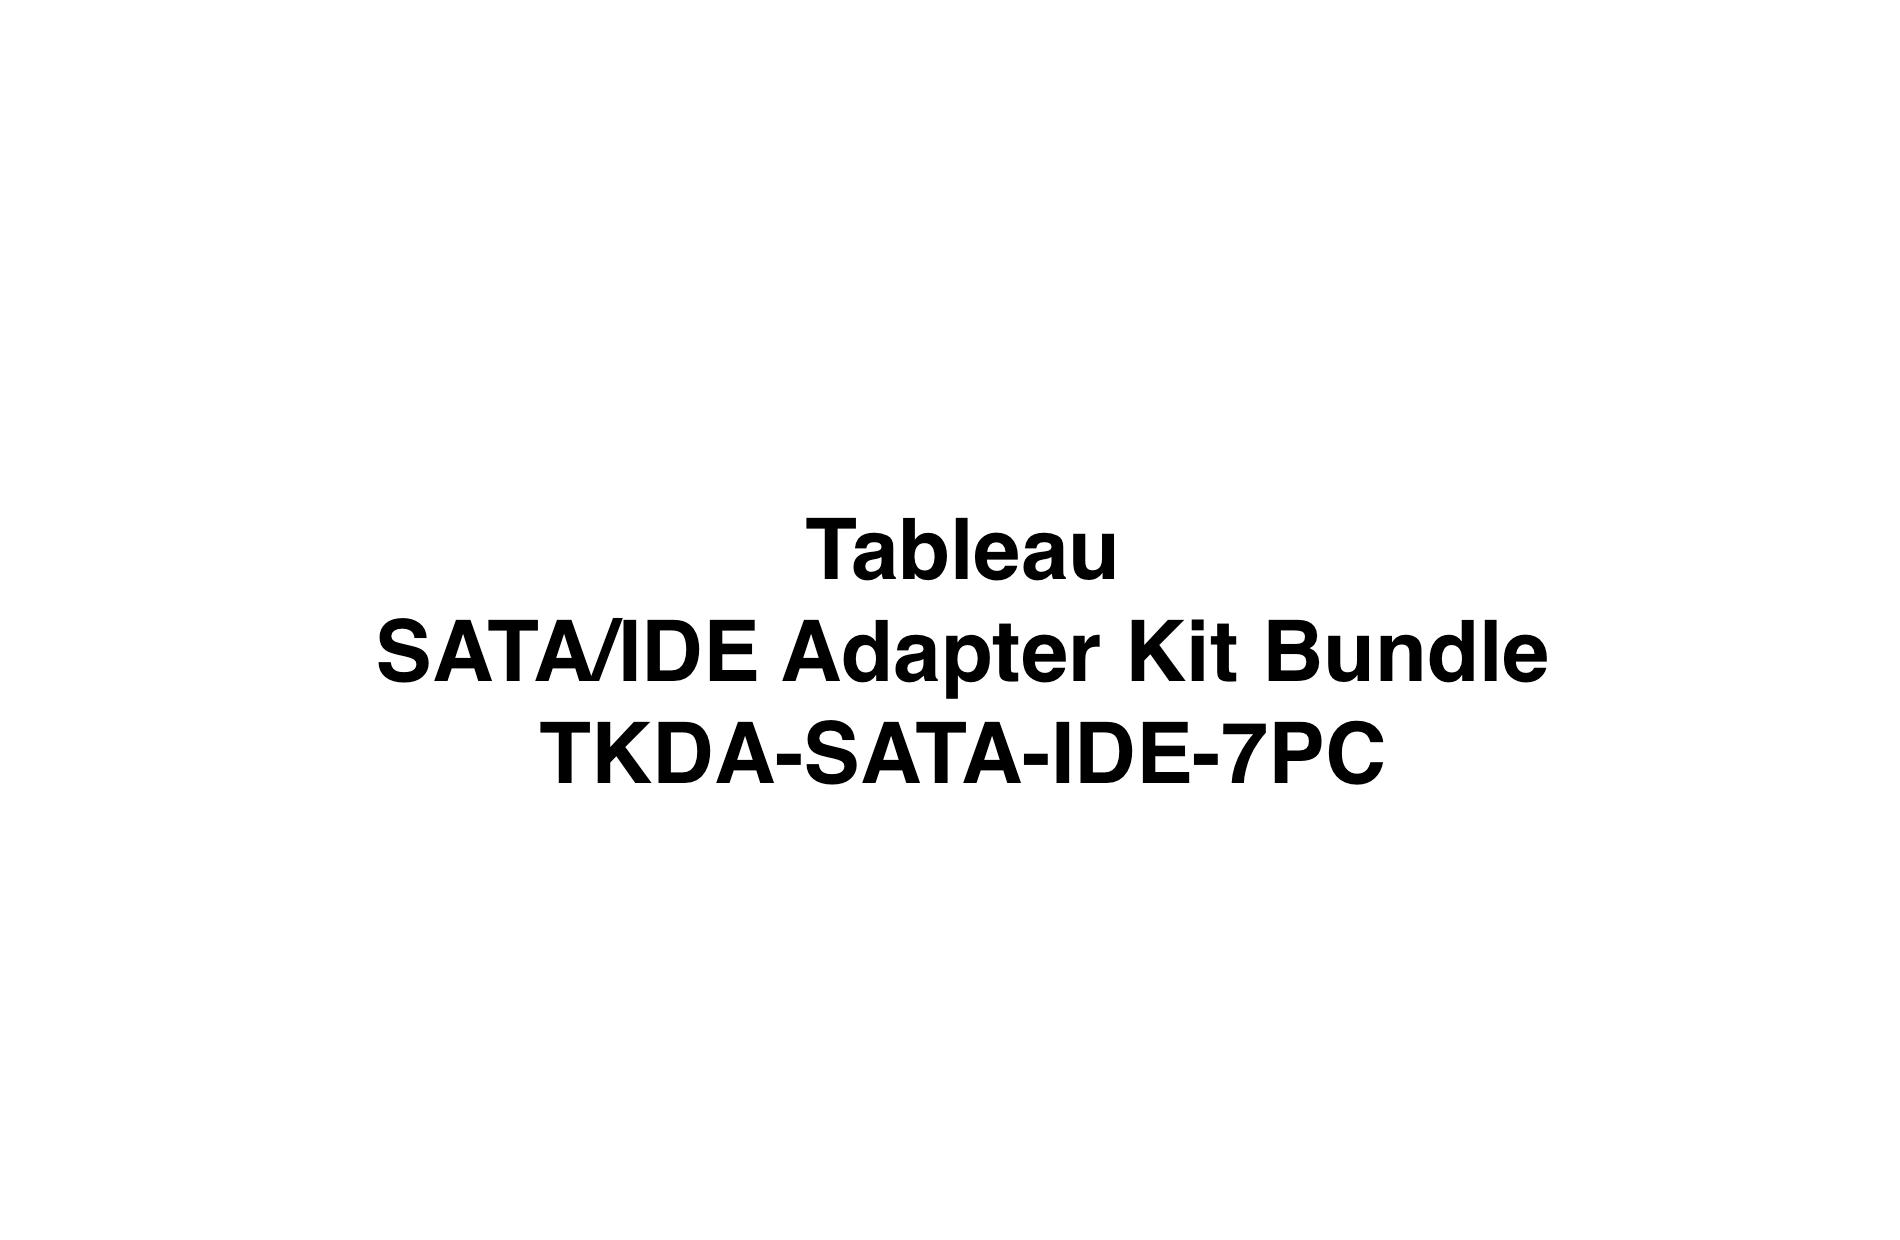 Picture of TKDA-SATA-IDE-7PC SATA/IDE Adapter Kit Bundle